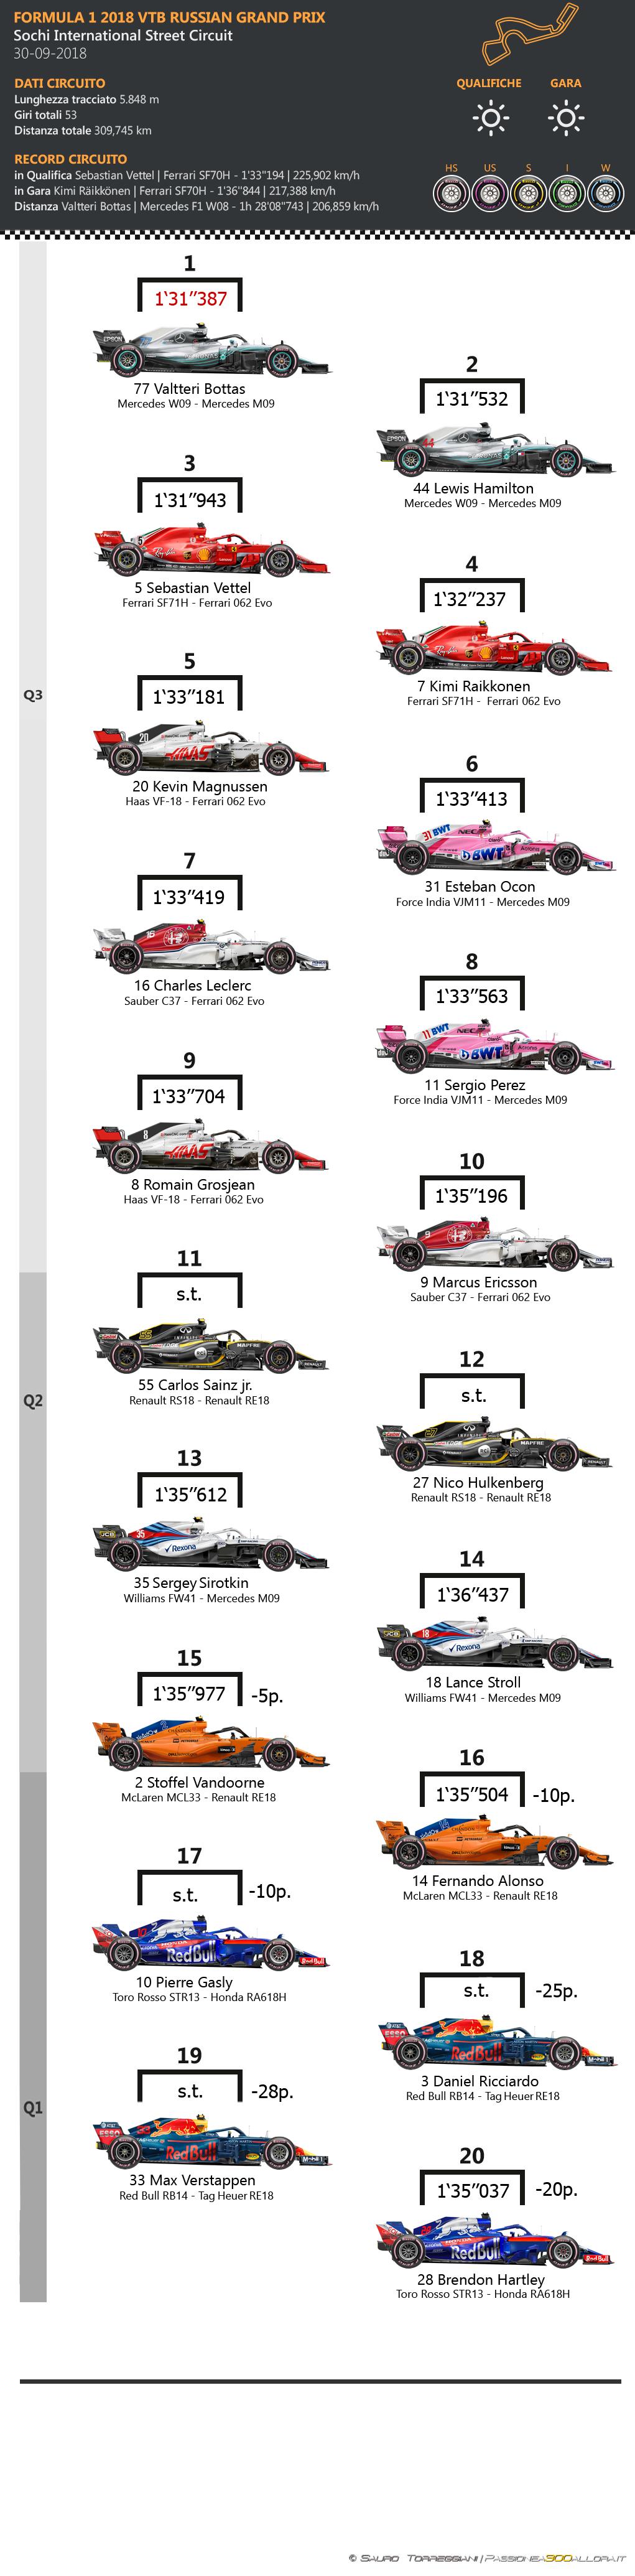 F1   GP di Russia 2018: griglia di partenza, penalità, set a disposizione 1